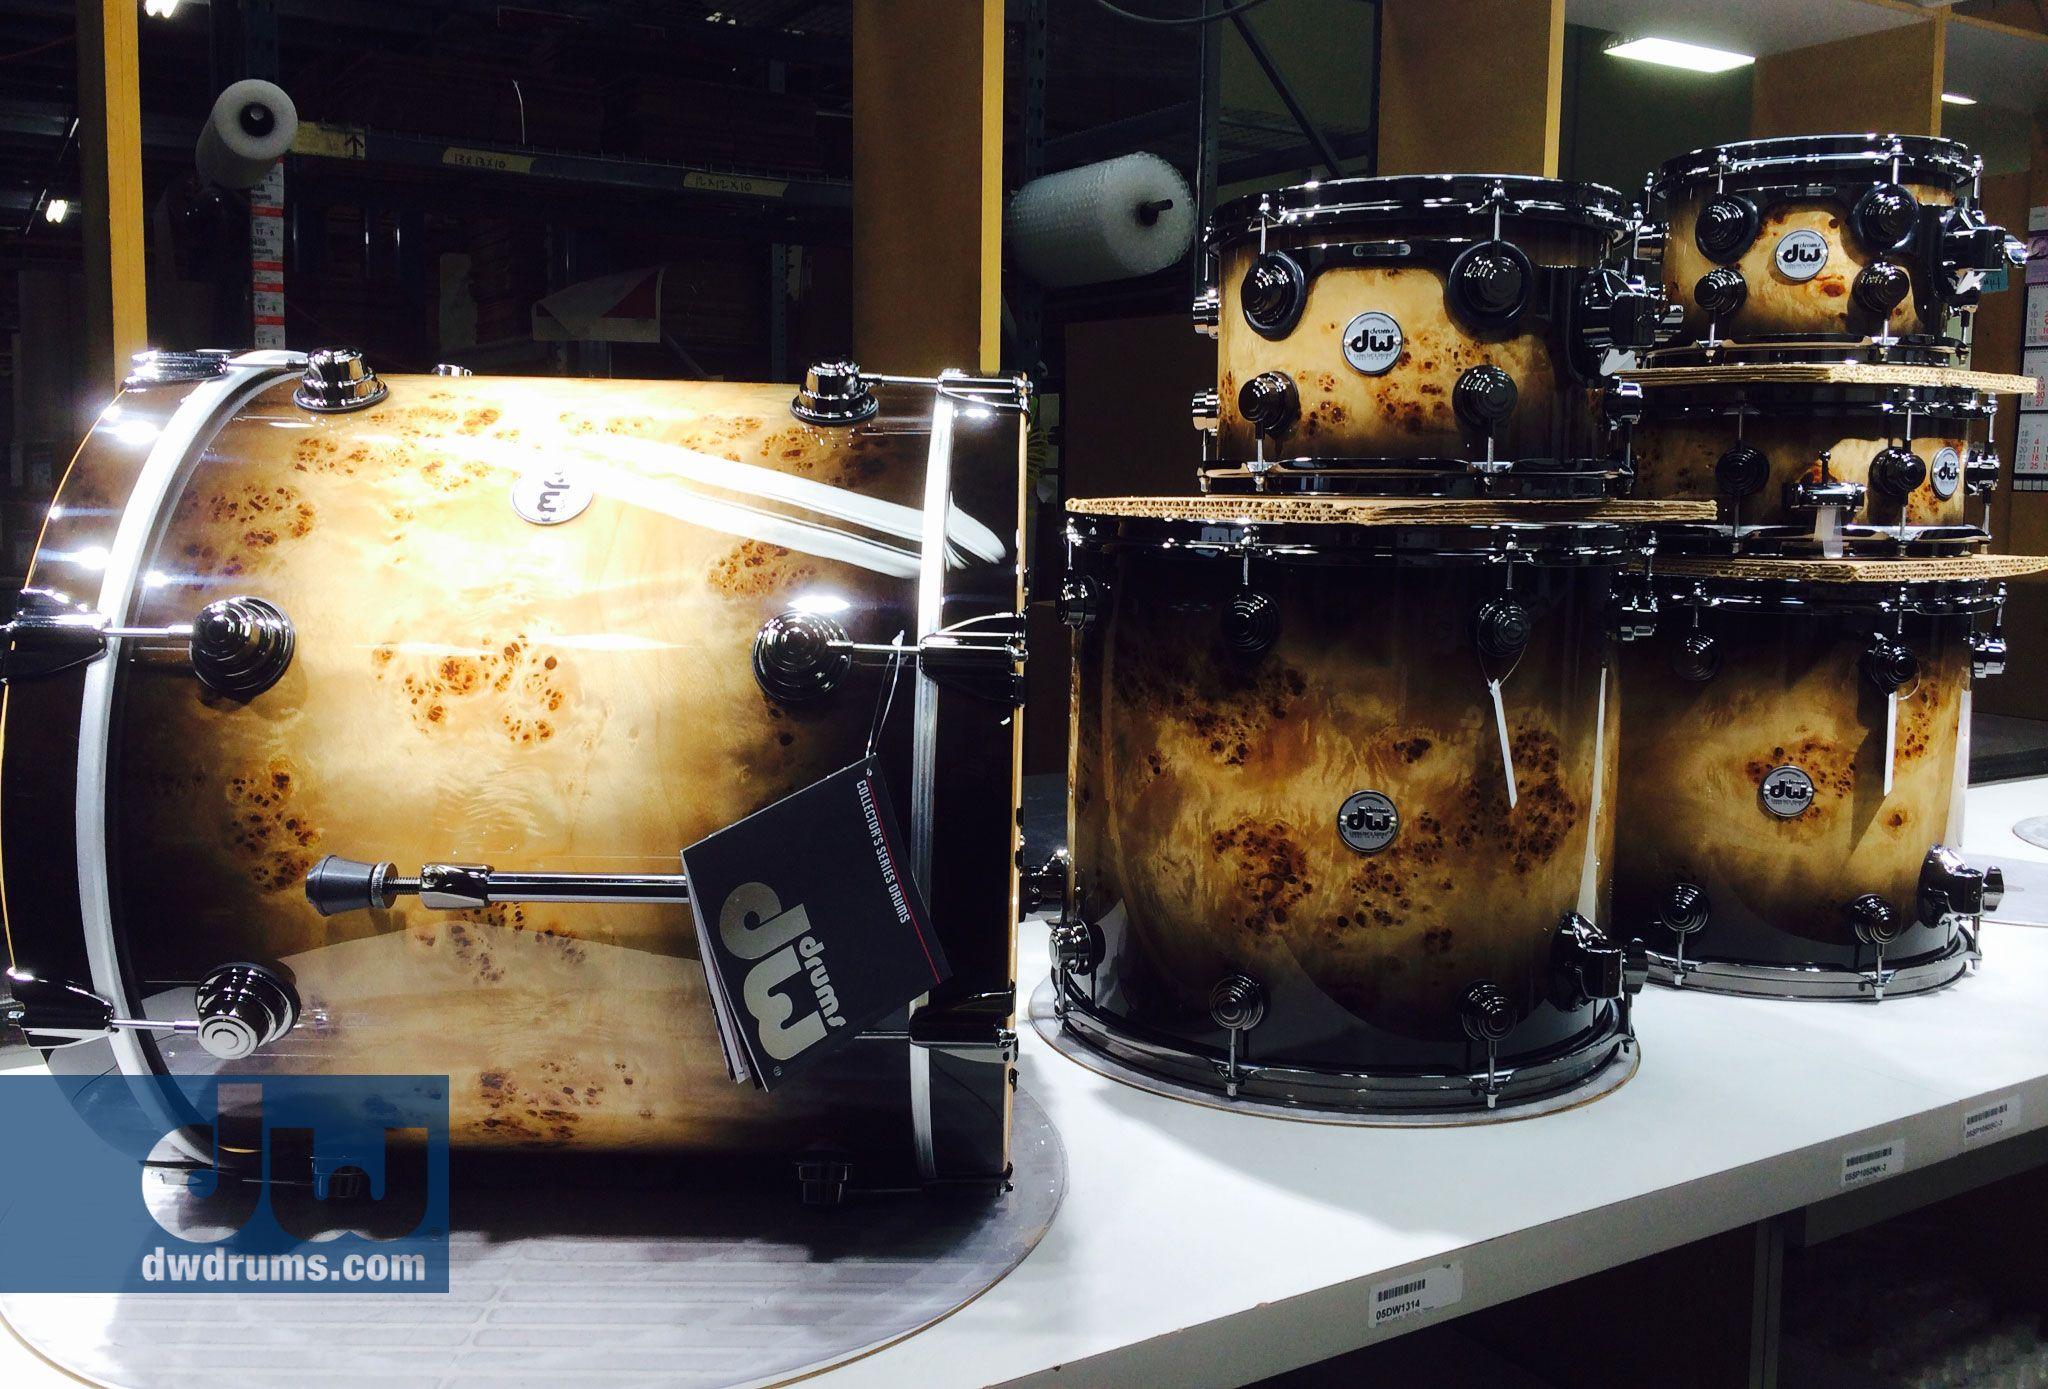 mapa burl Drum kits, Percussion instruments, Percussion